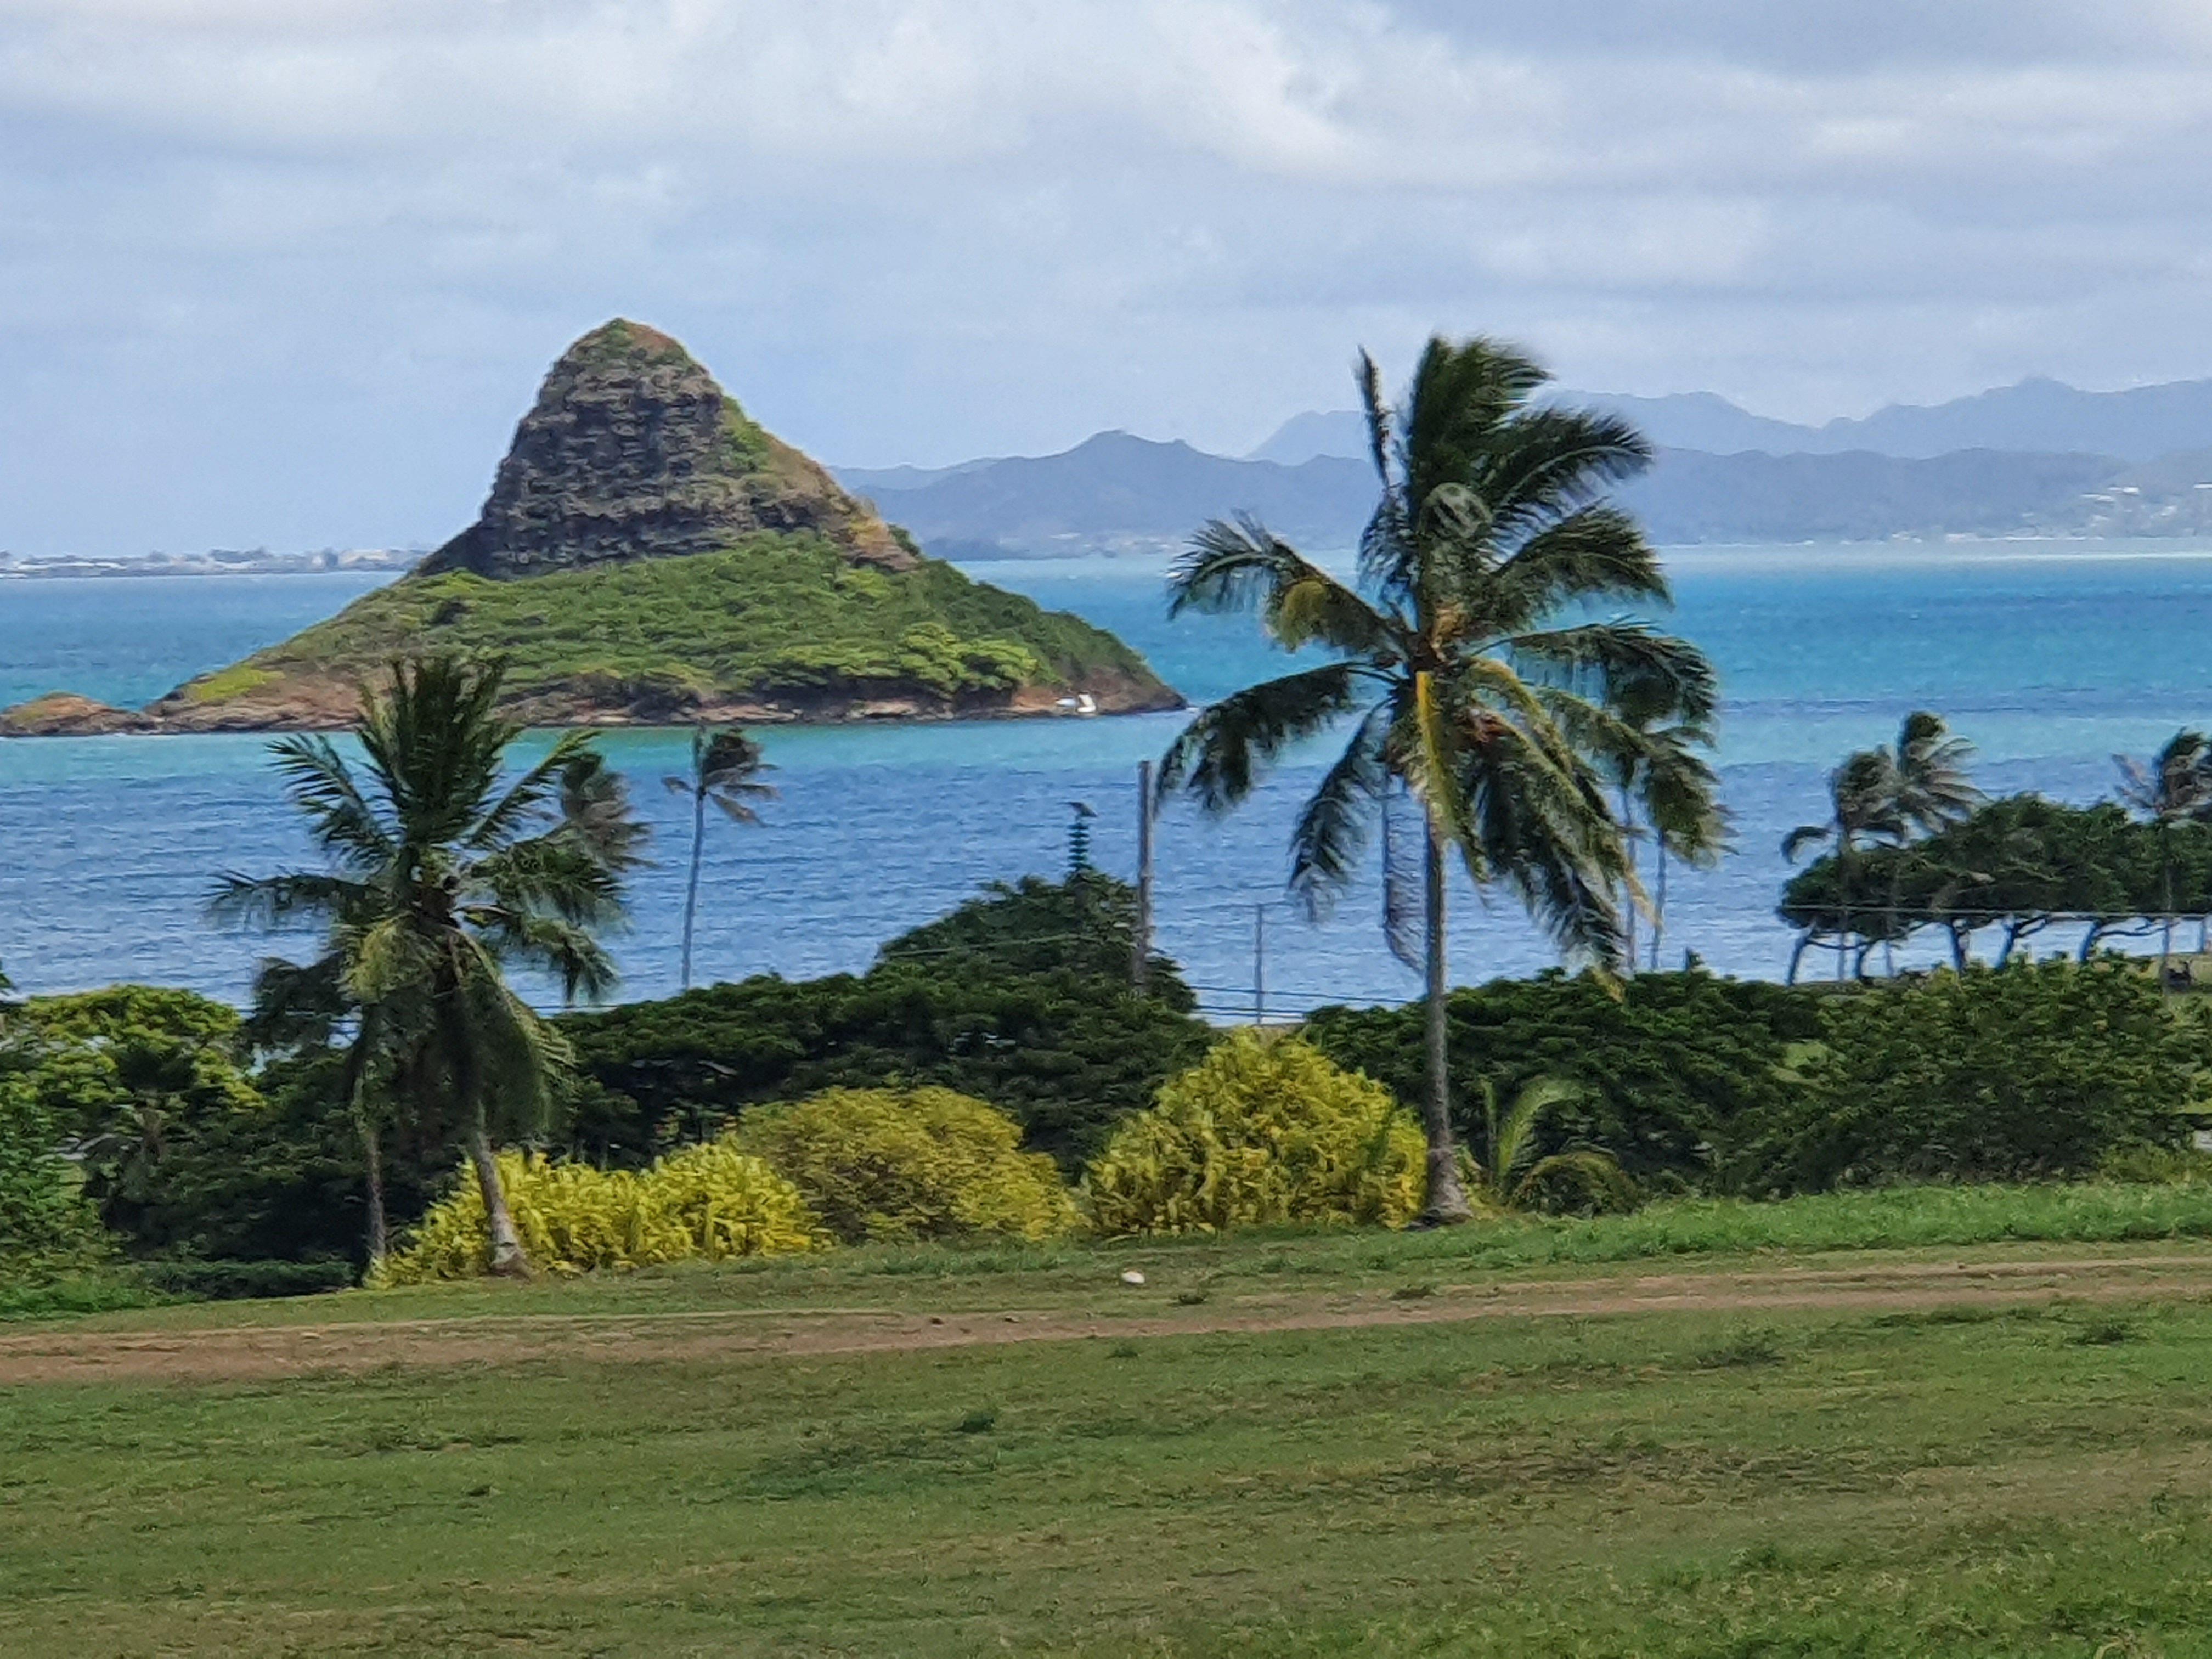 Chinaman's Hat - Mokolii Oahu Hawaii